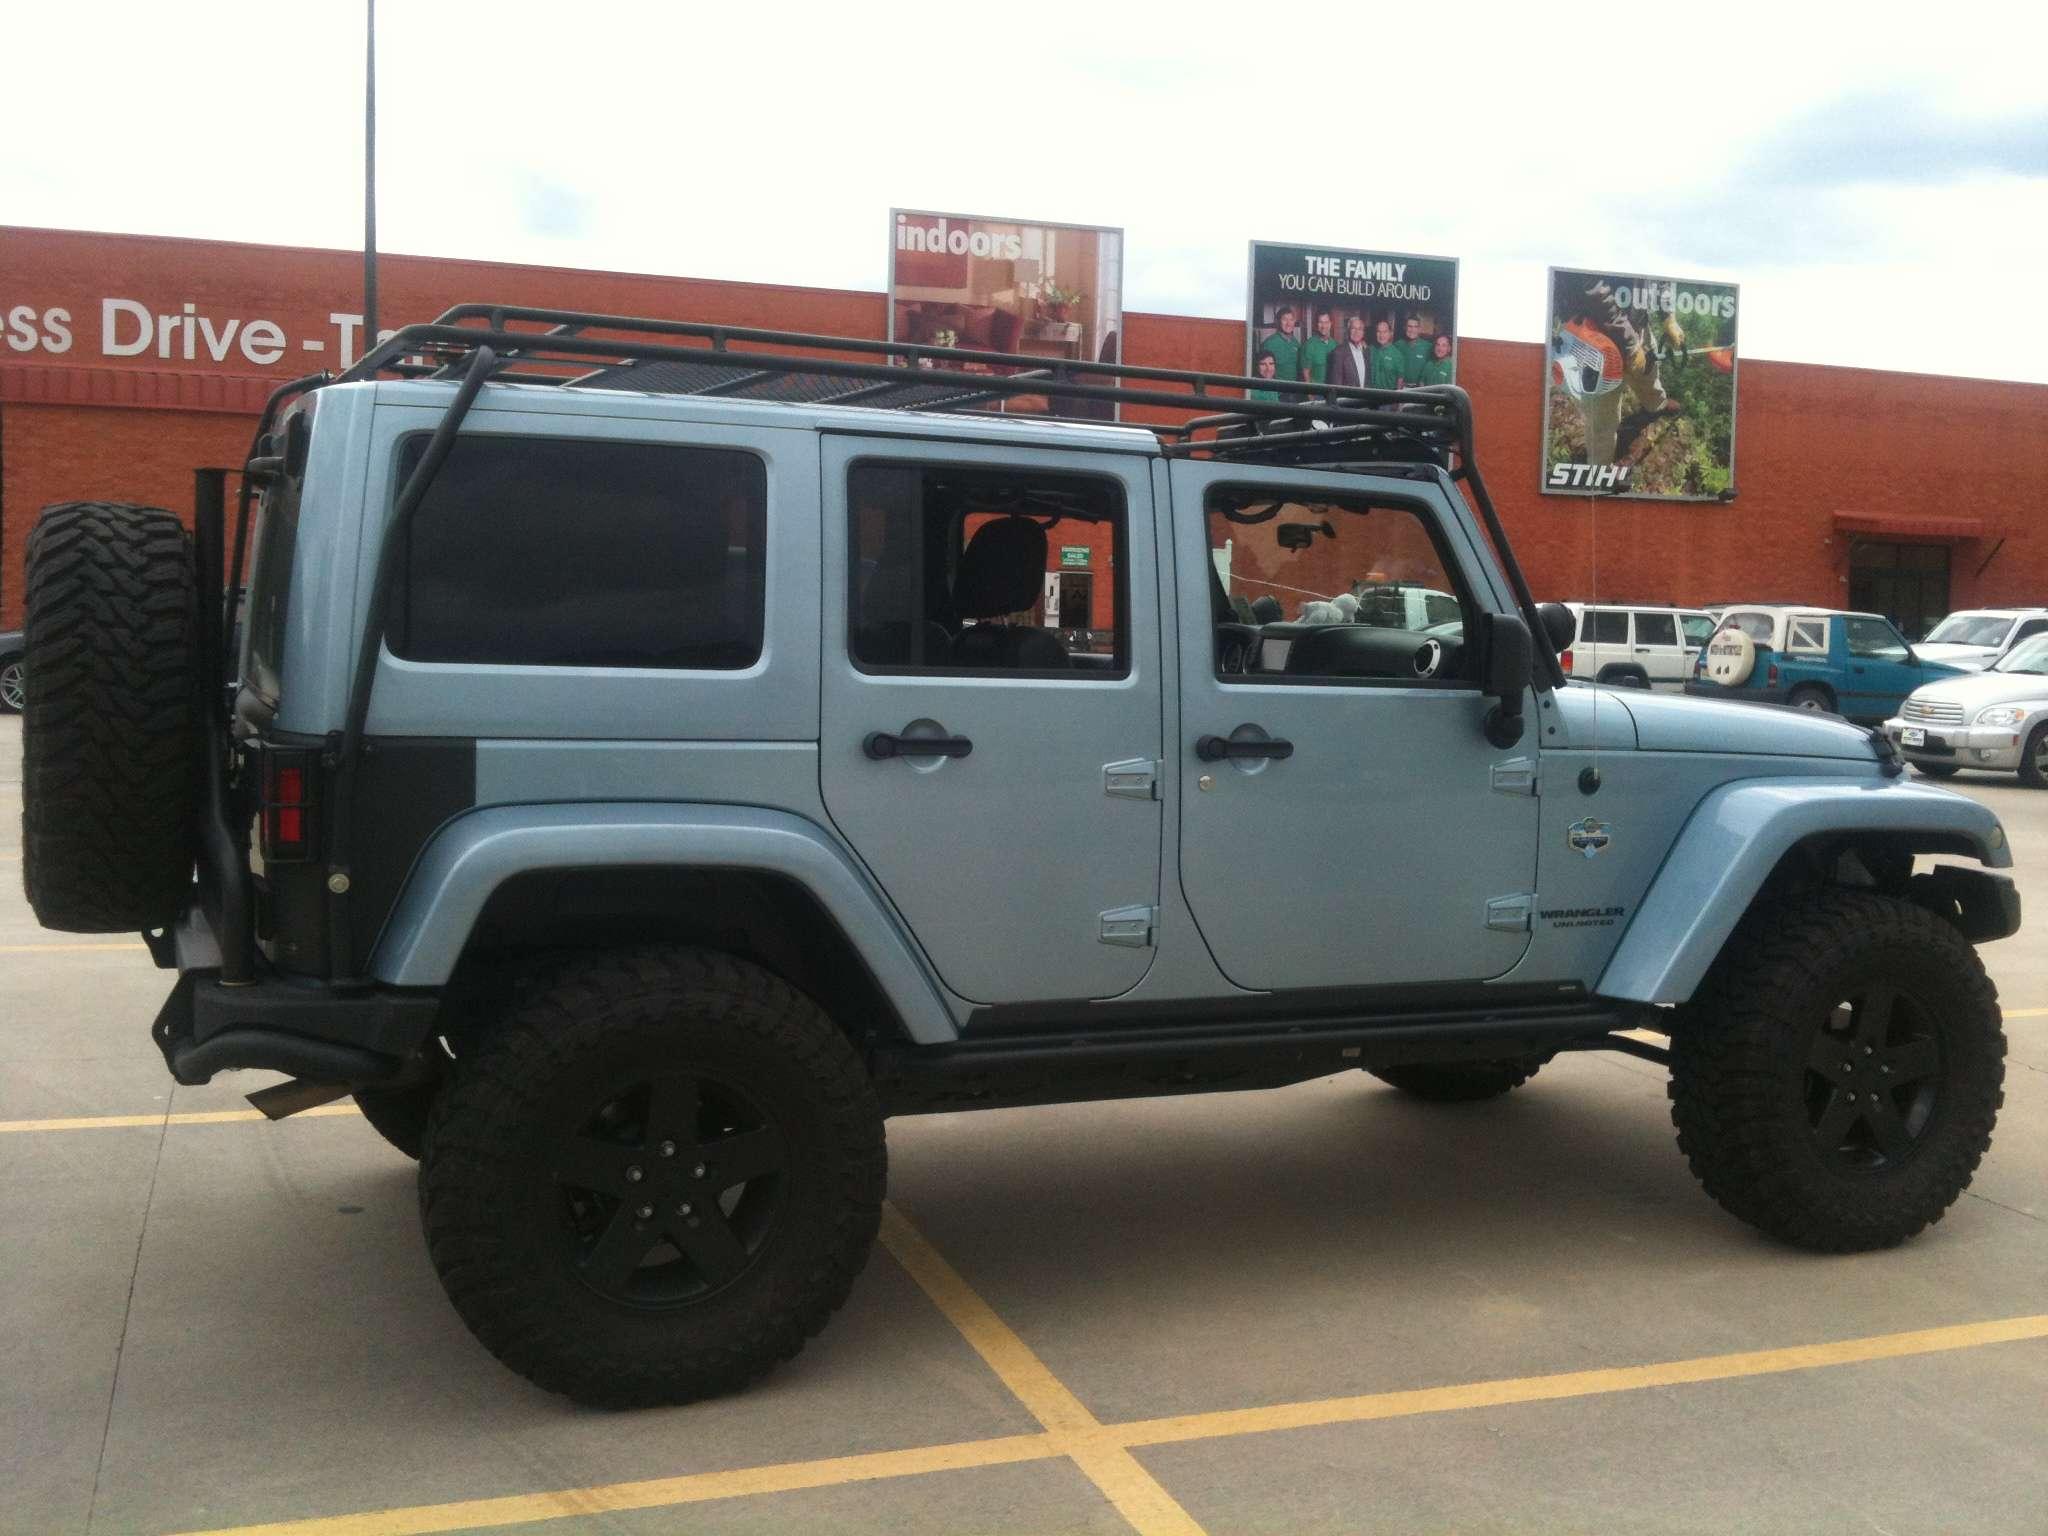 Jeep Wrangler For Sale Ct >> FS JKU Gobi Roof Rack - JKowners.com : Jeep Wrangler JK Forum